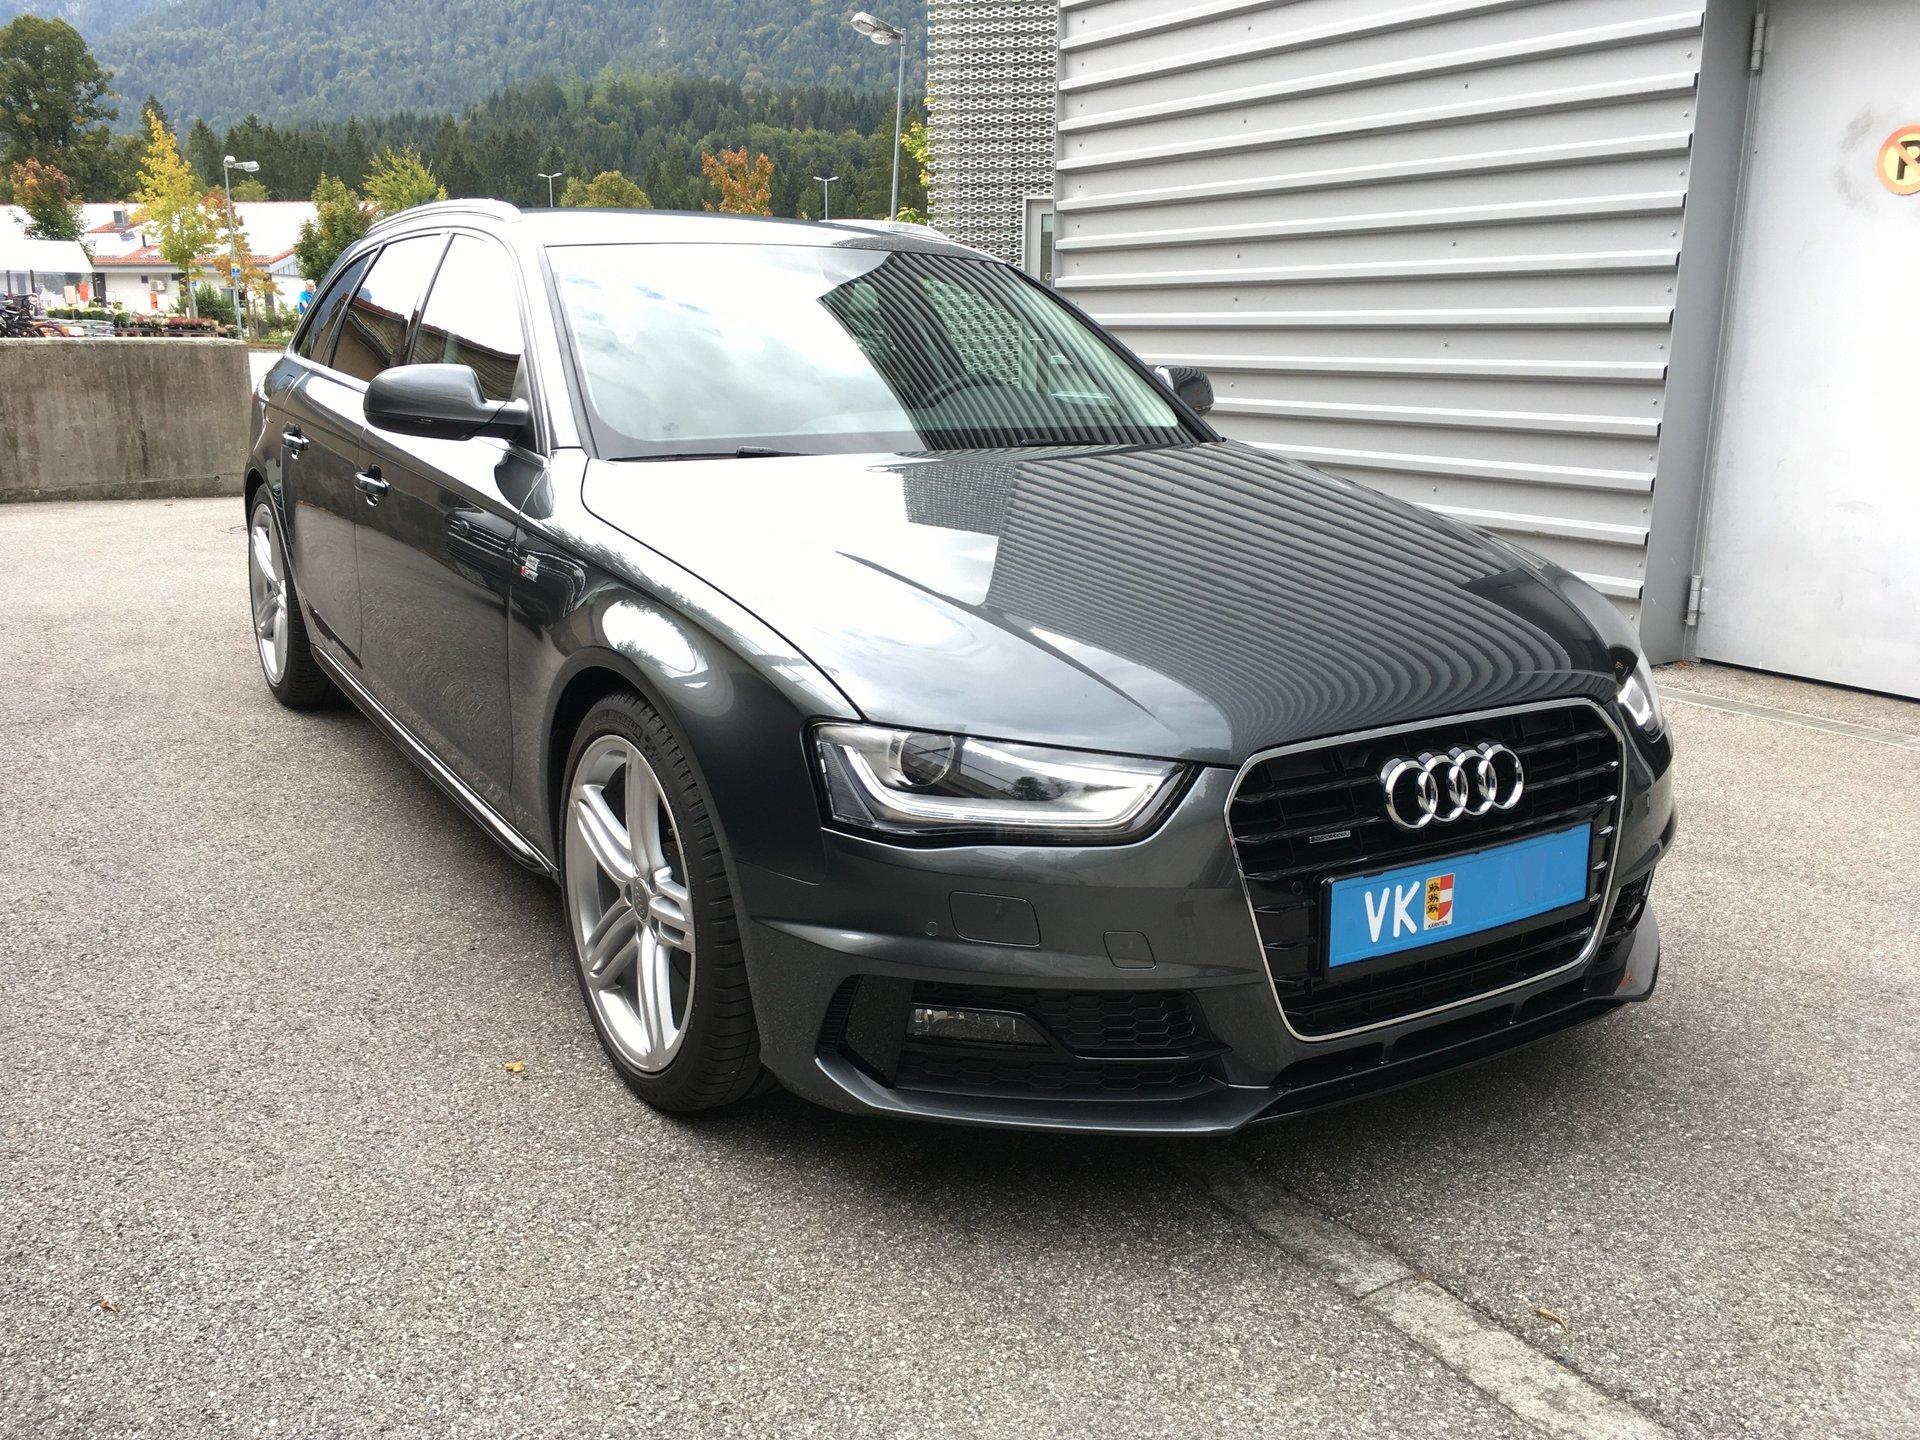 Audi A4 B8 Avant 2 0 Tdi Quattro Sport Edition Plus